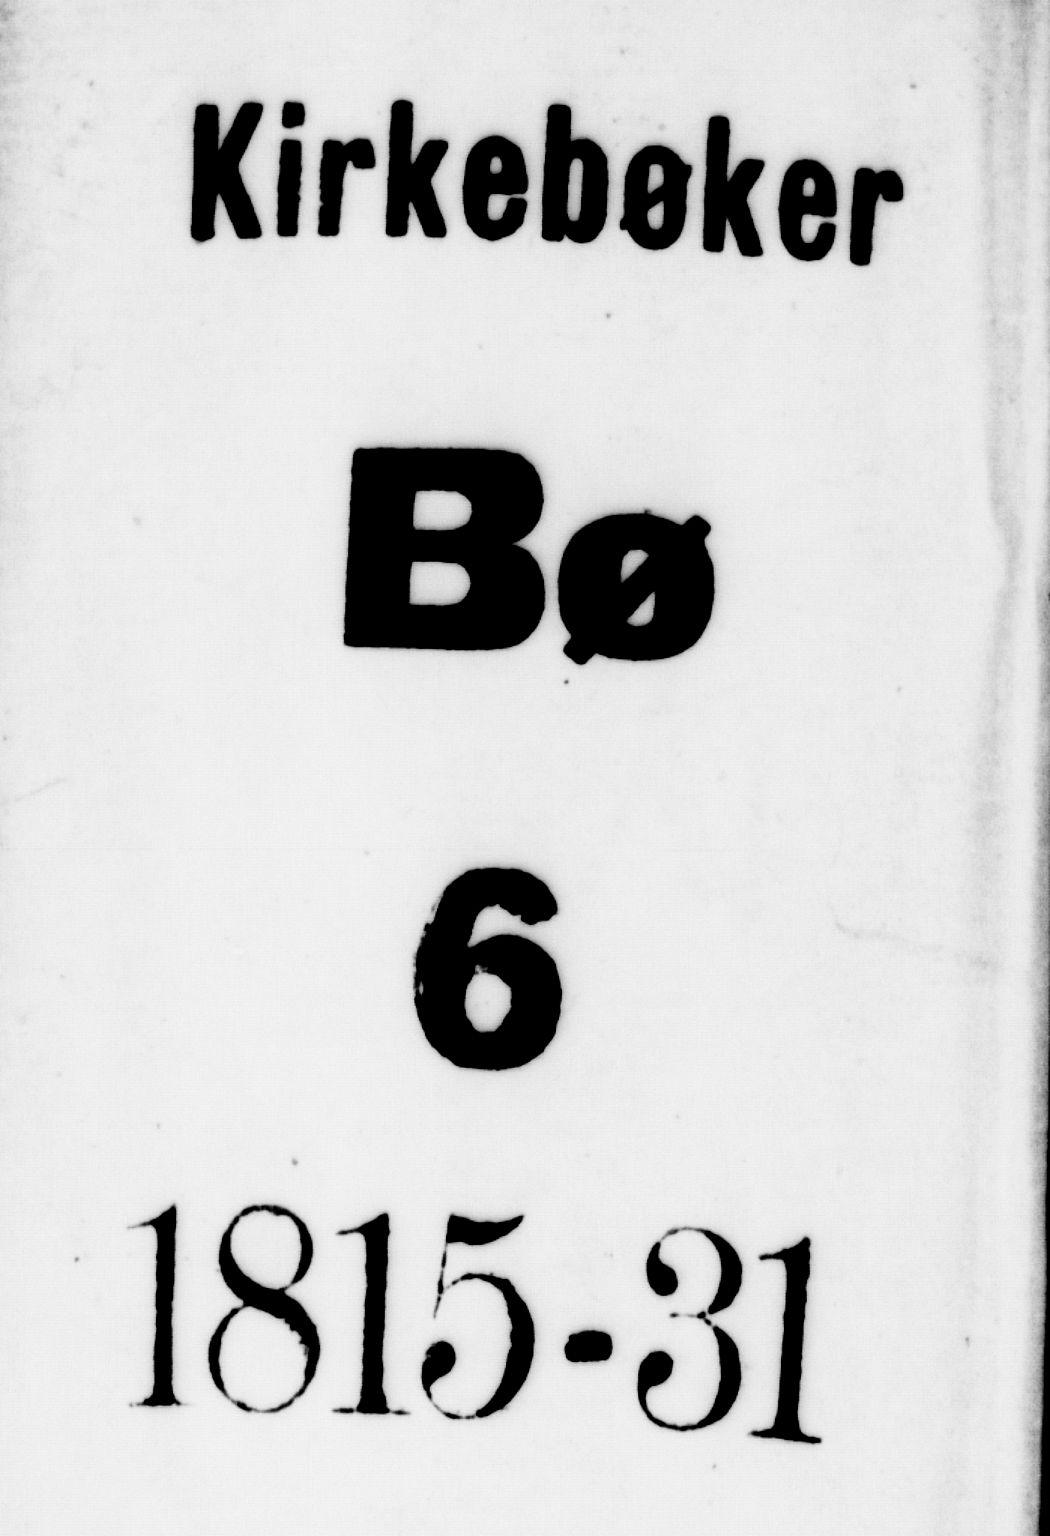 SAKO, Bø kirkebøker, G/Ga/L0001: Klokkerbok nr. 1, 1815-1831